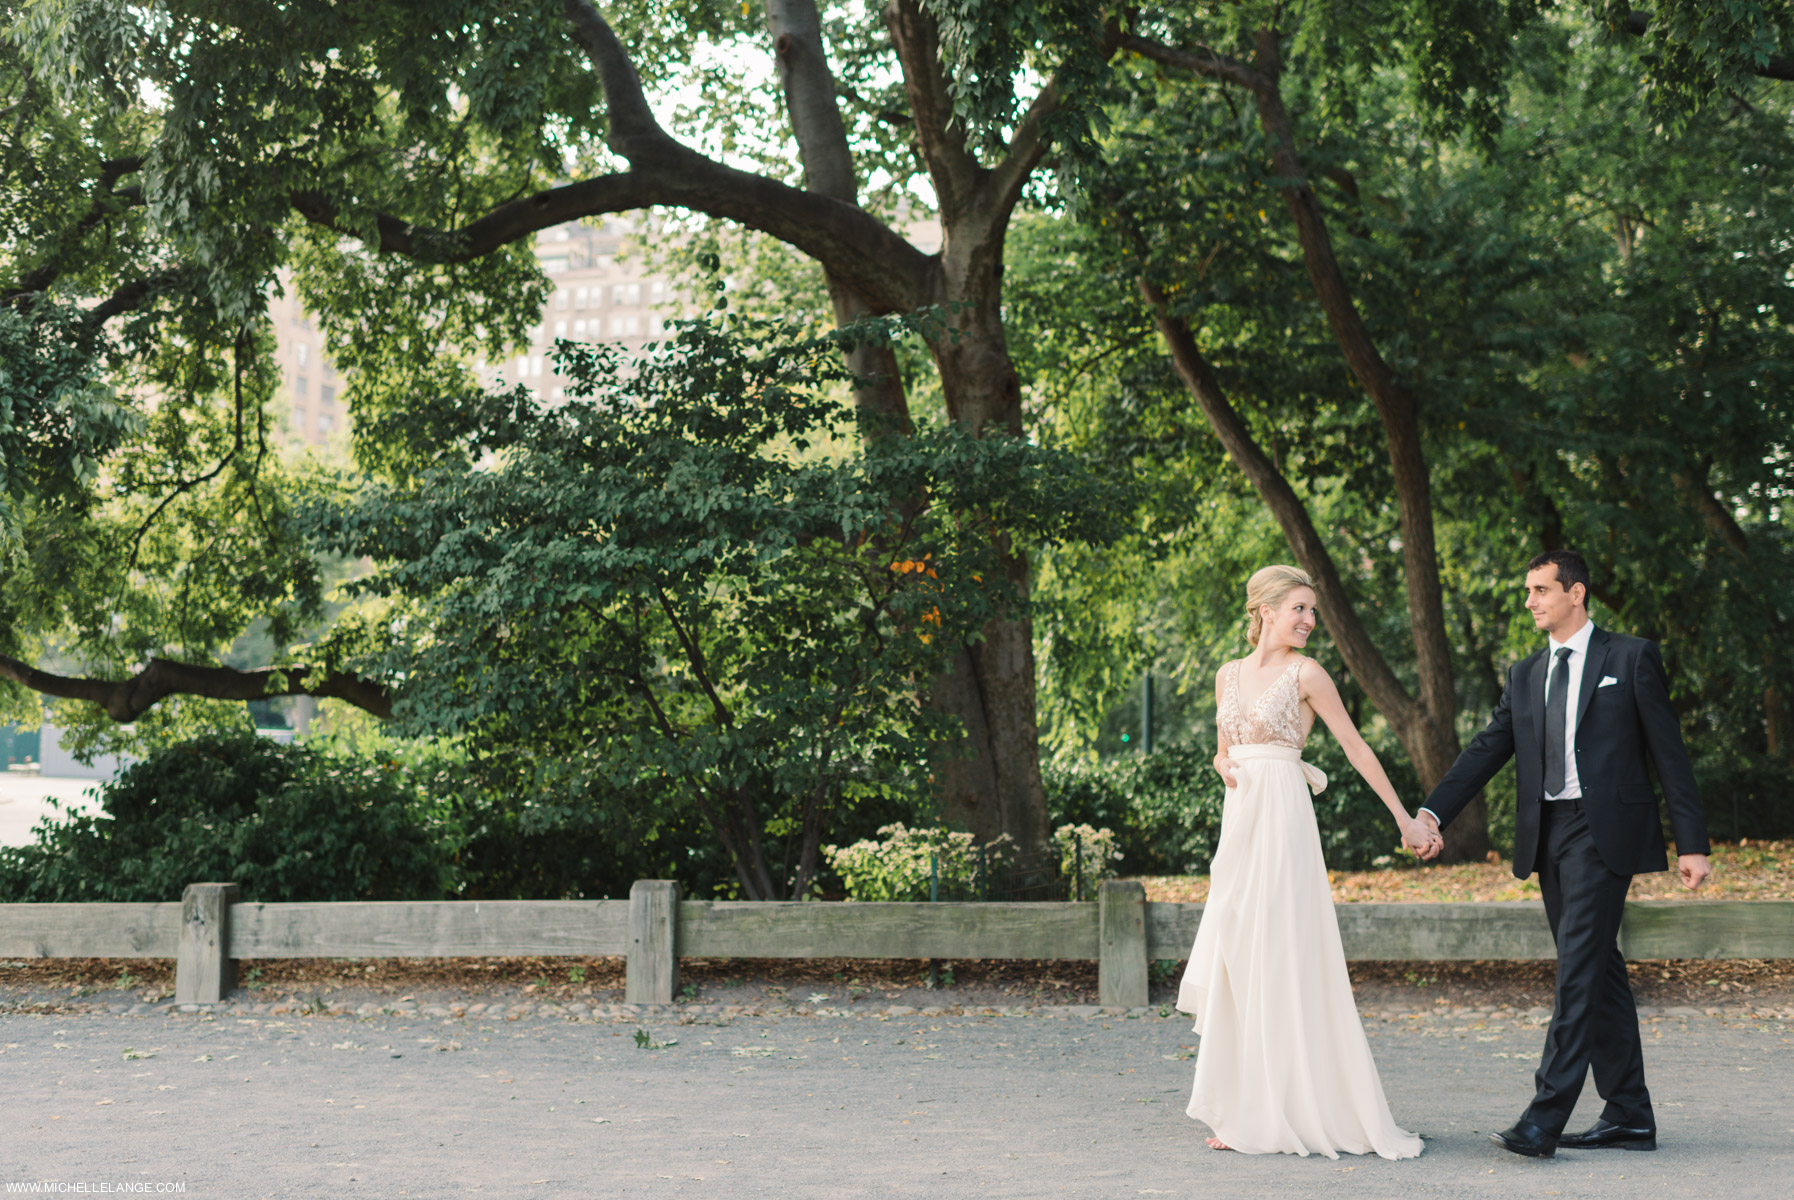 NYC Central Park Elopement Photographer